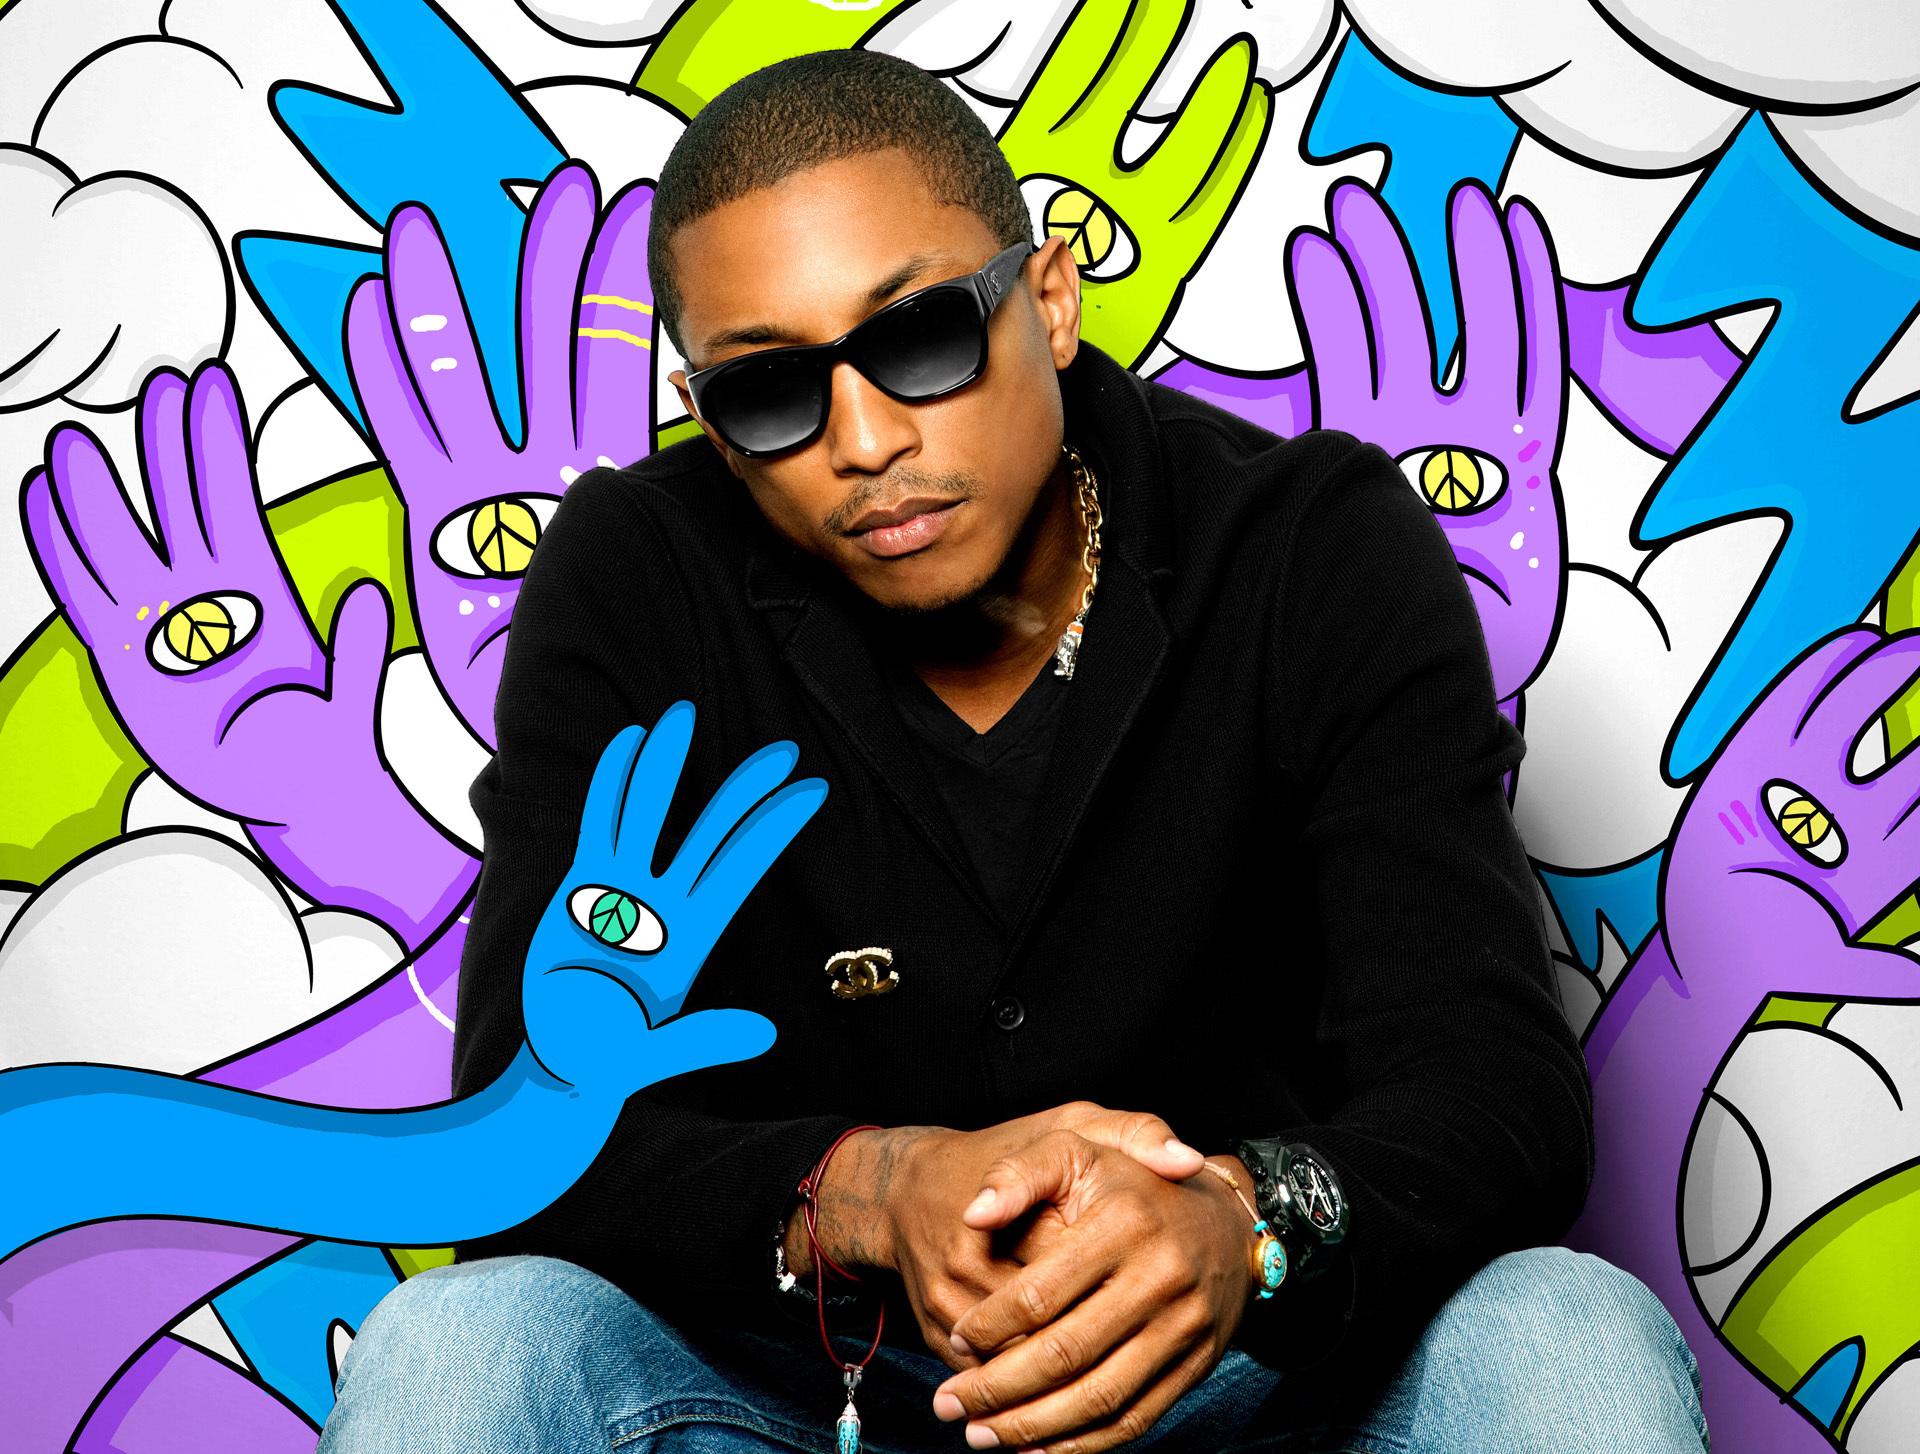 Pharrell Williams Wallpapers Hd